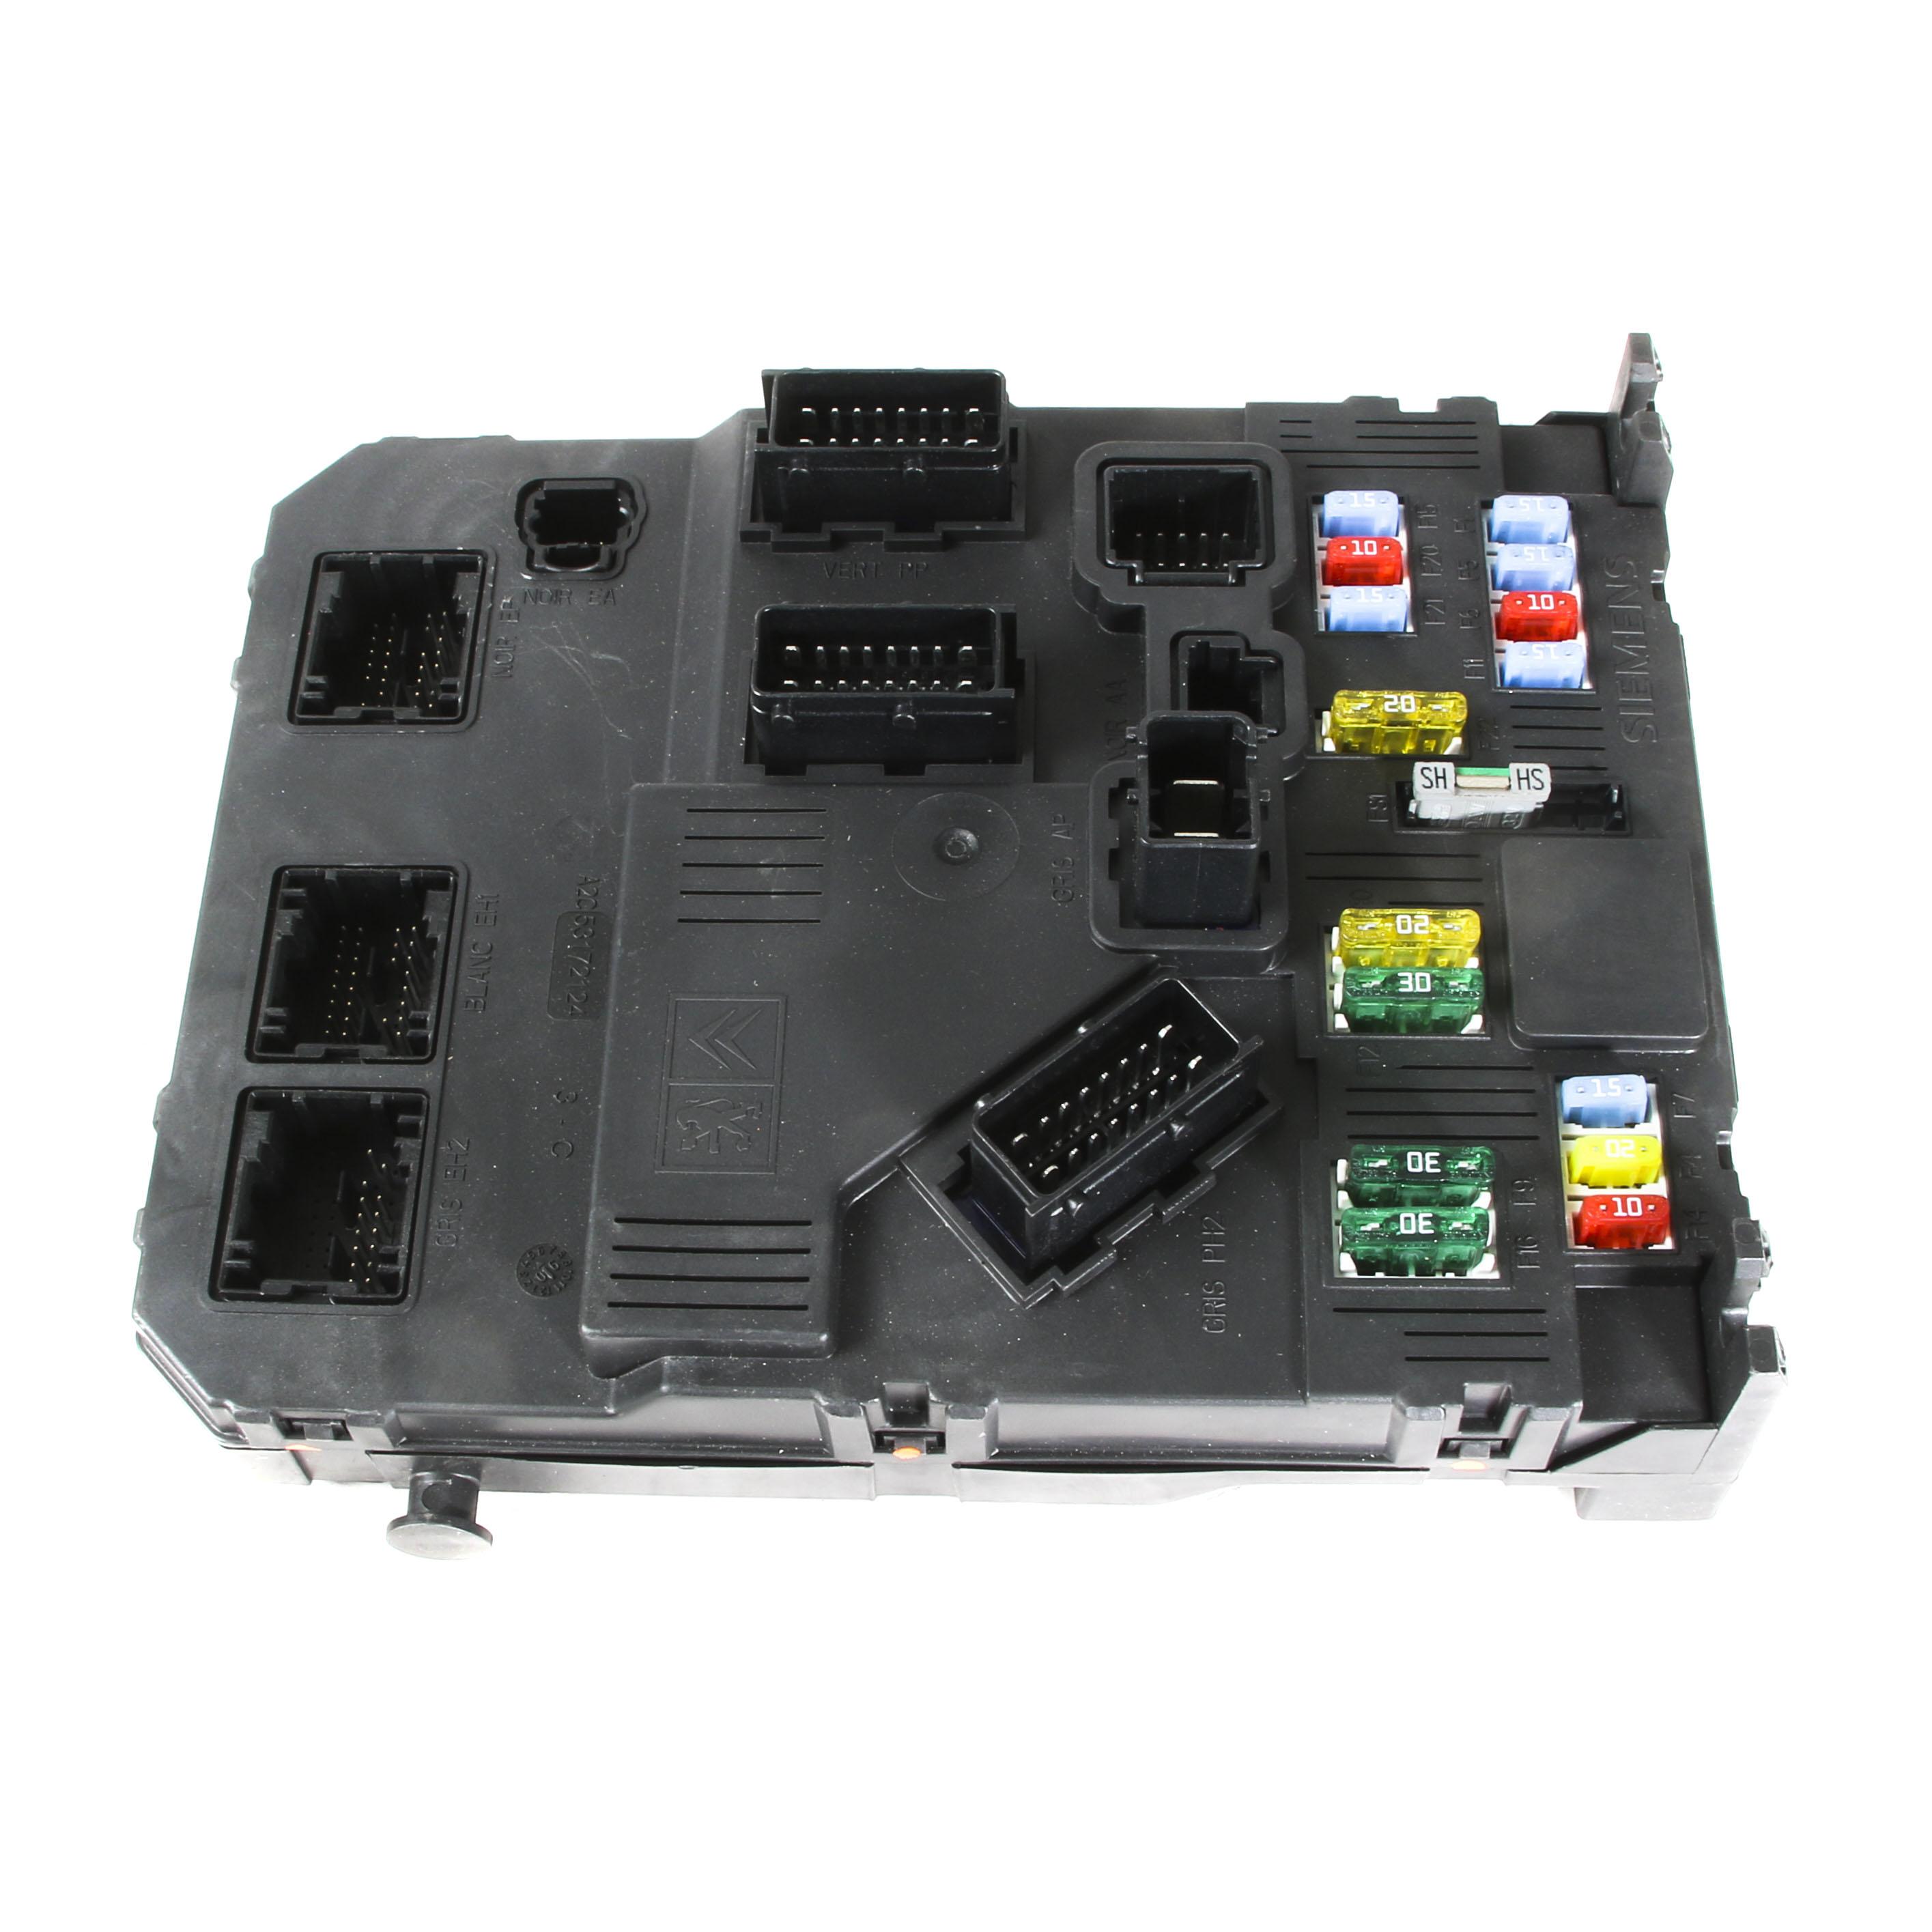 Peugeot 206 Fuse Box Where Auto Electrical Wiring Diagram 307 2007 Genuine Siemens Bsi 658065 6580fp